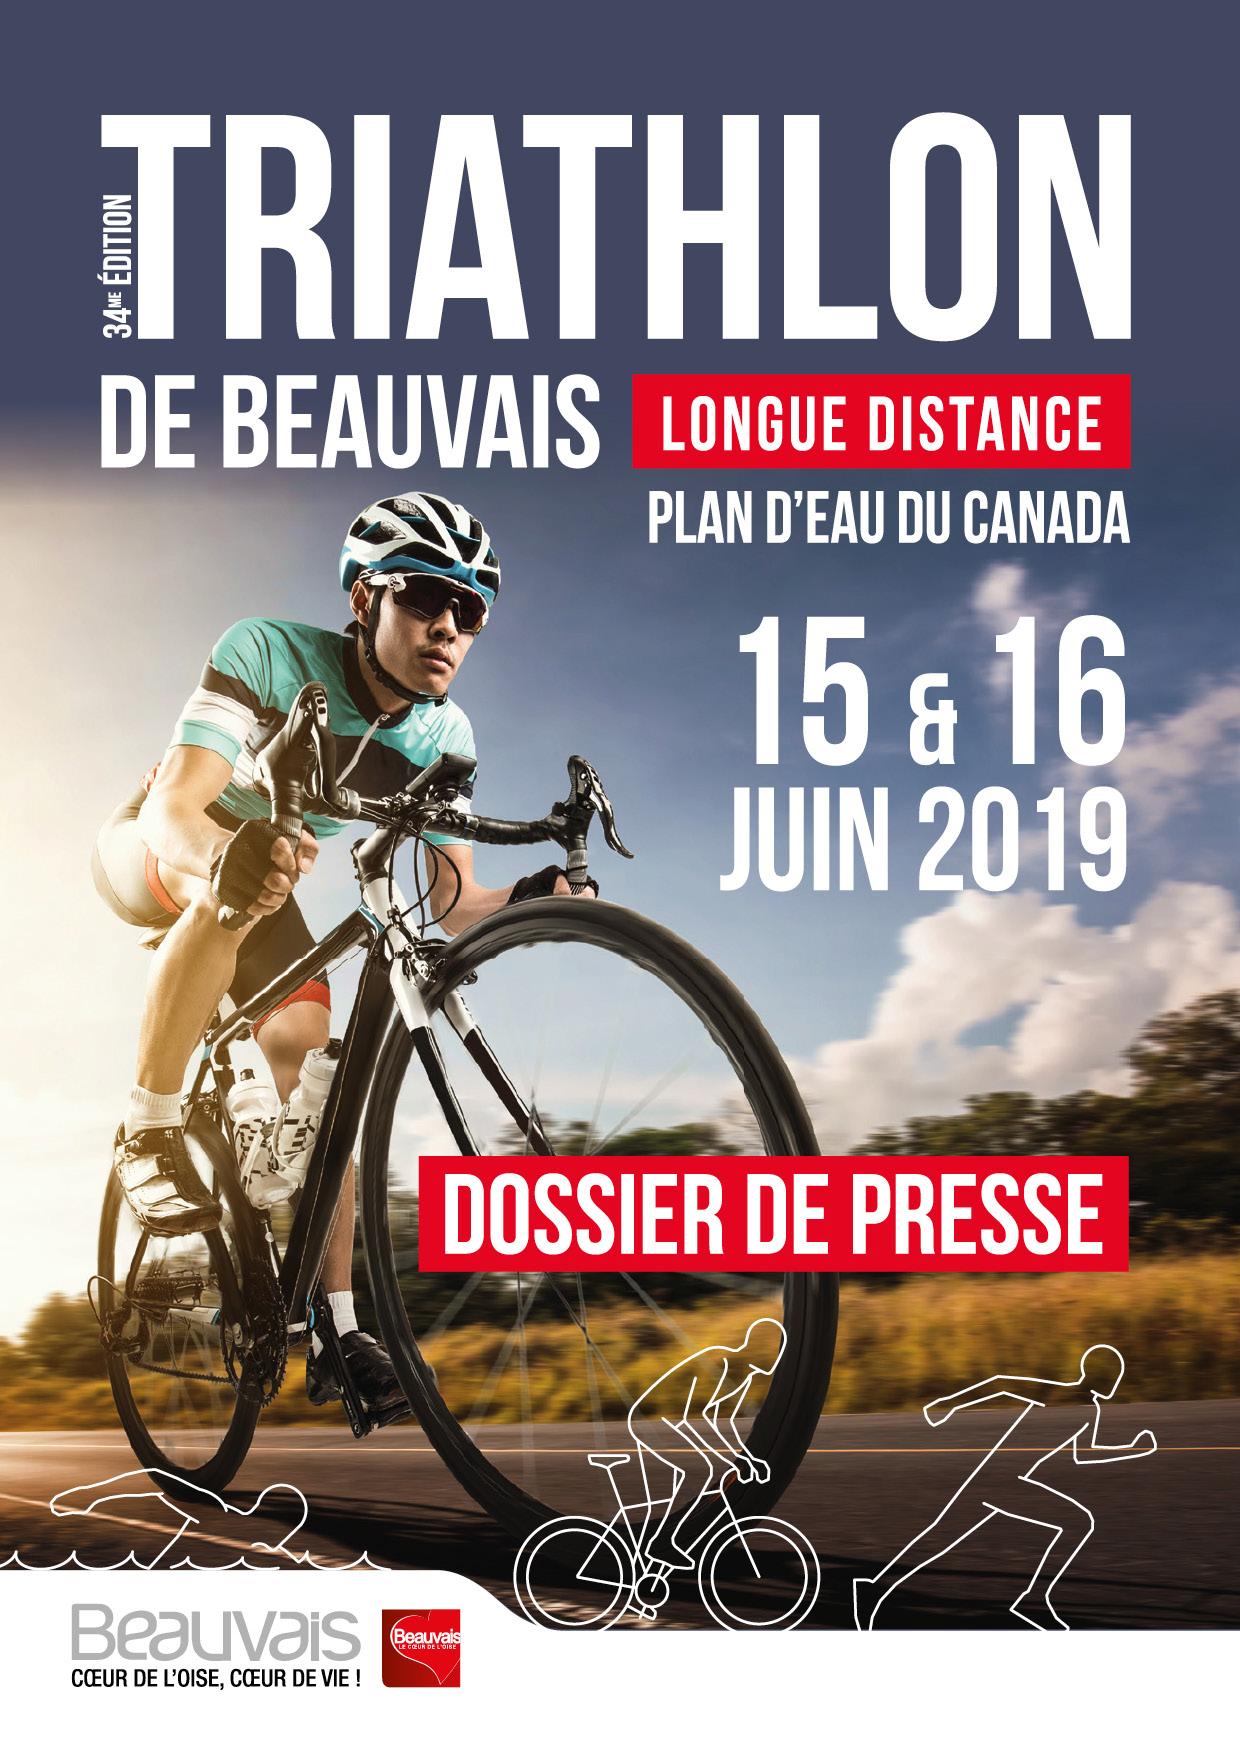 dossier-presse-triathlon-beauvais-vec